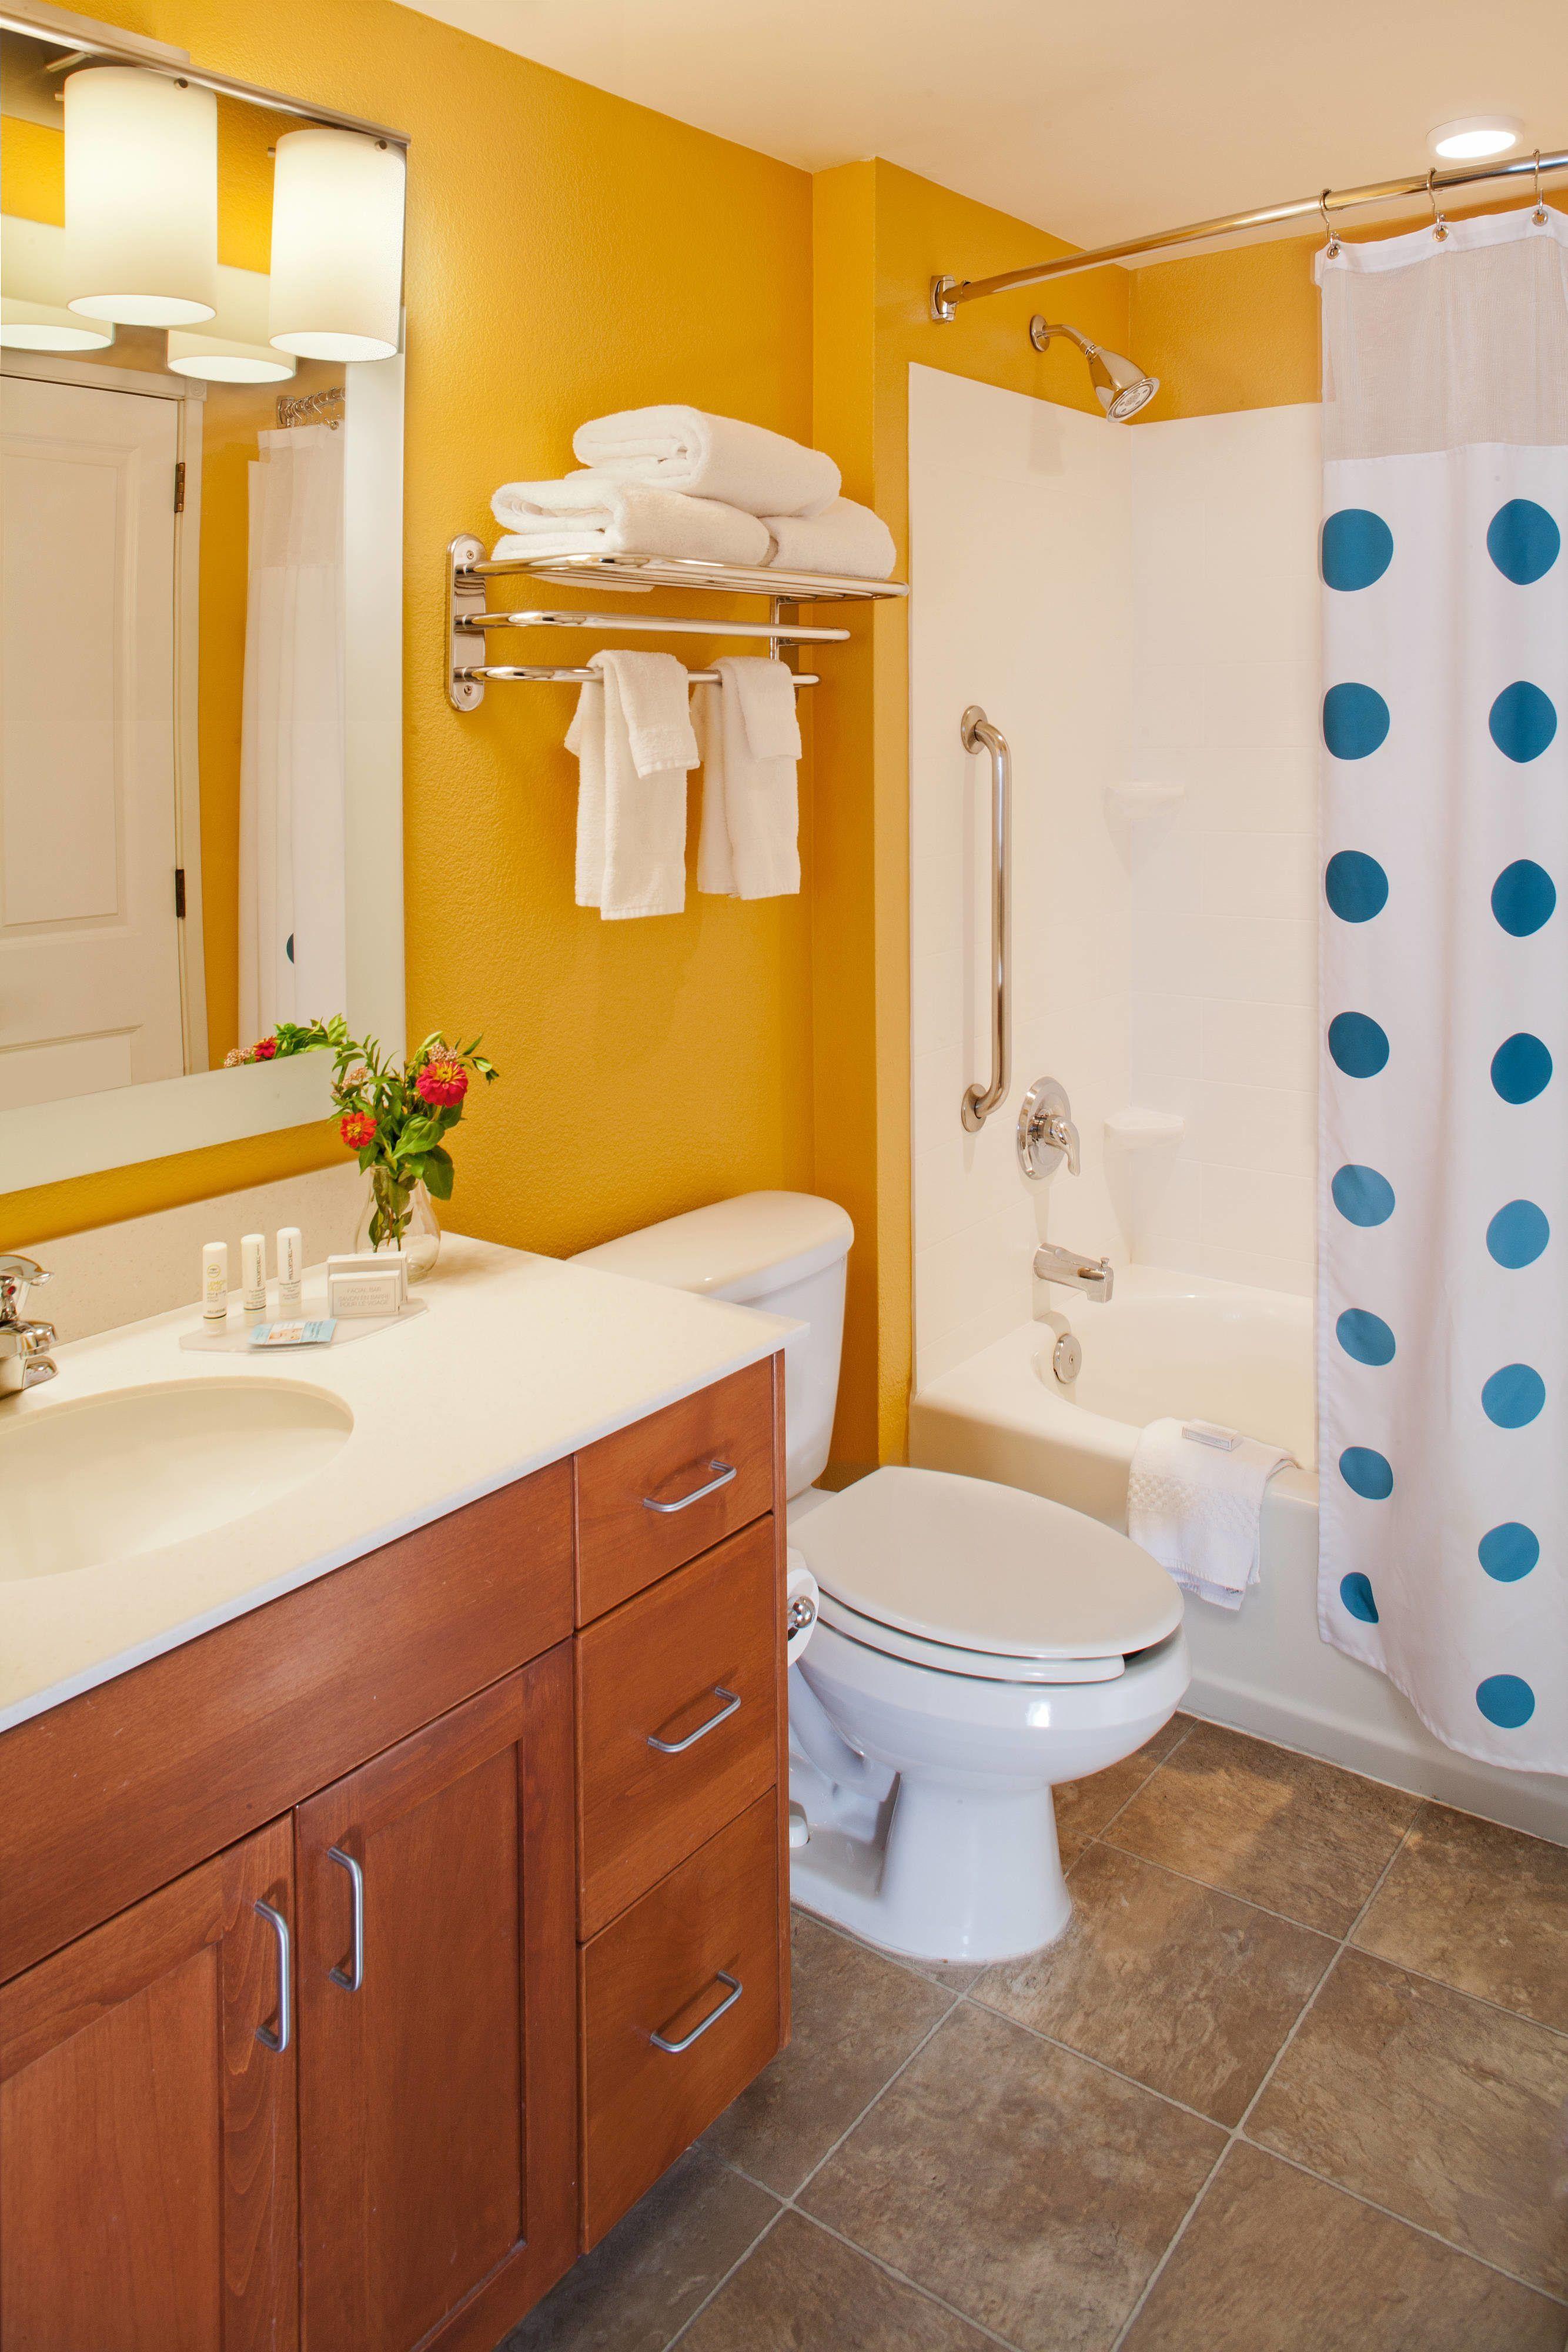 Towneplace Suites Medford Suite Bathroom Memorable Guestroom Enjoy Suites Oregon Hotels How To Memorize Things